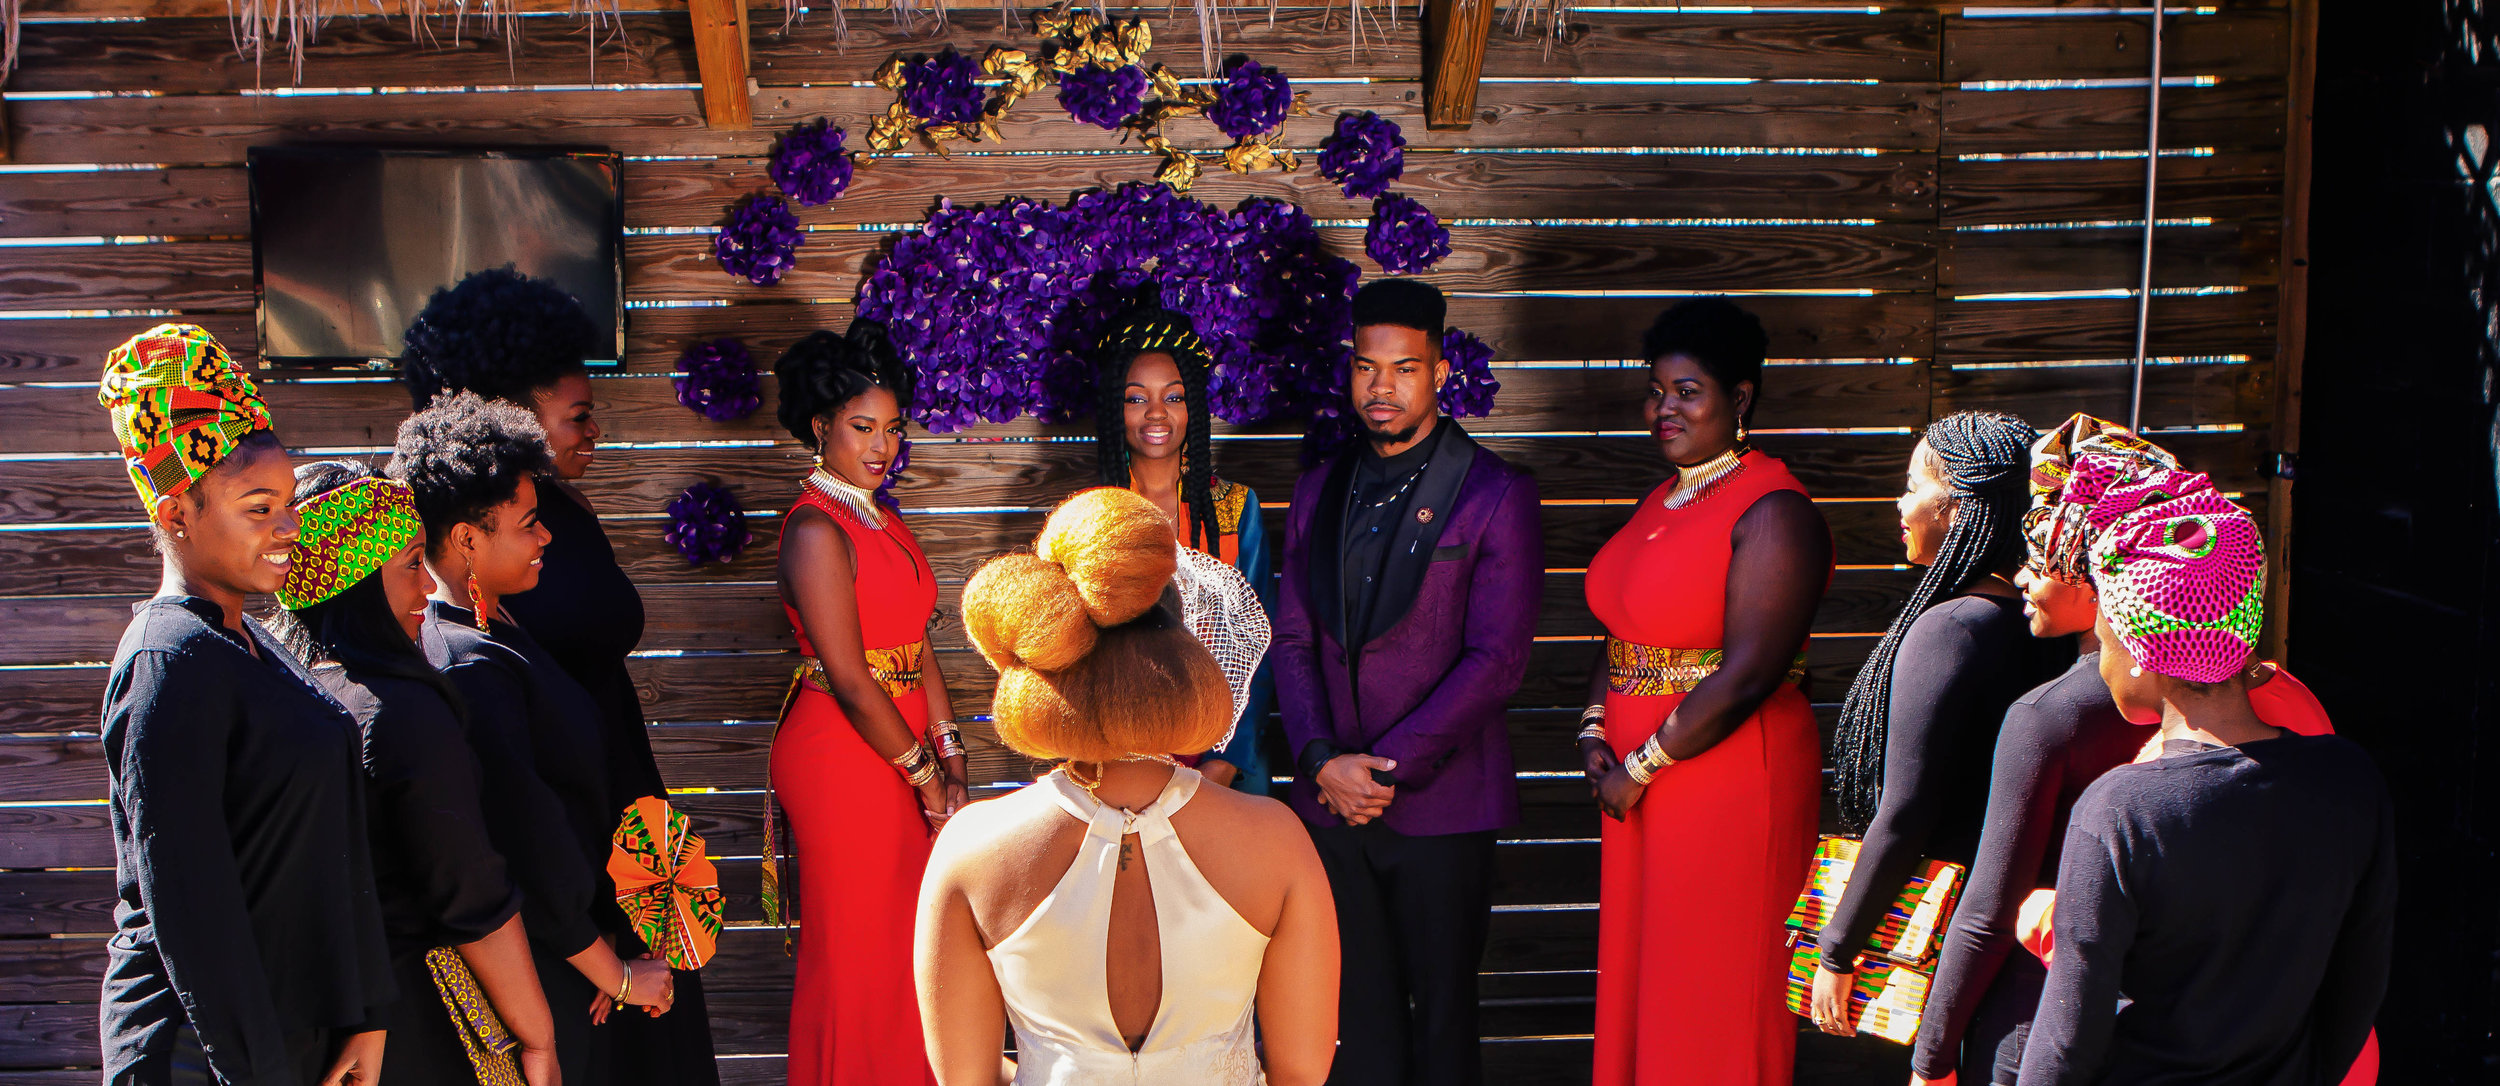 Luxe LeBlanc_Wakandan Wedding_Bridal Party and Guests 2.jpg